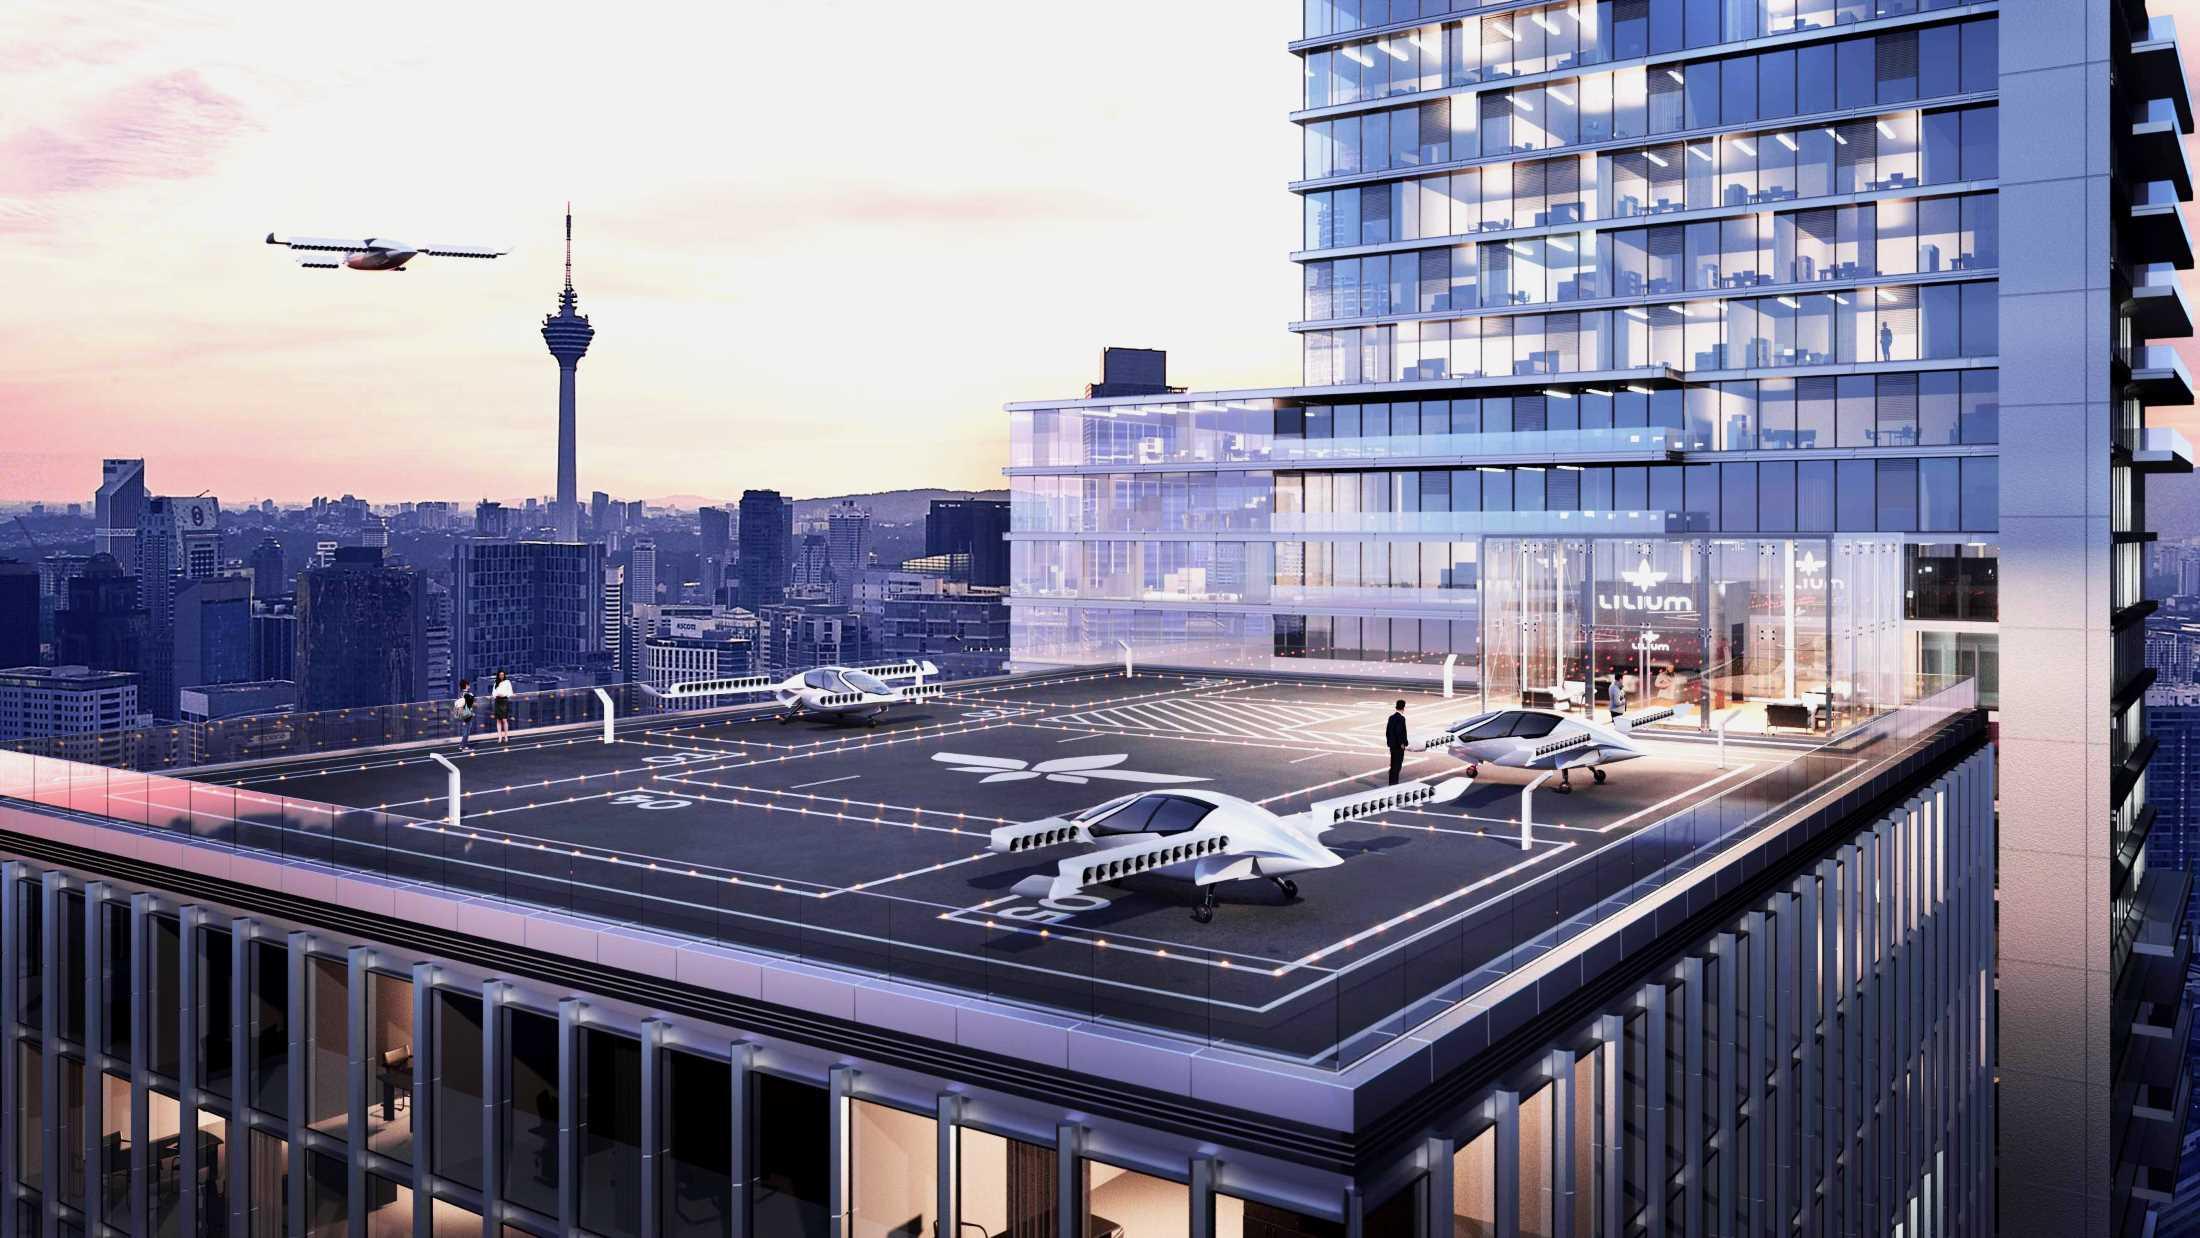 Lilium VTOL vertical take off and landing jet flying on demand air transport future